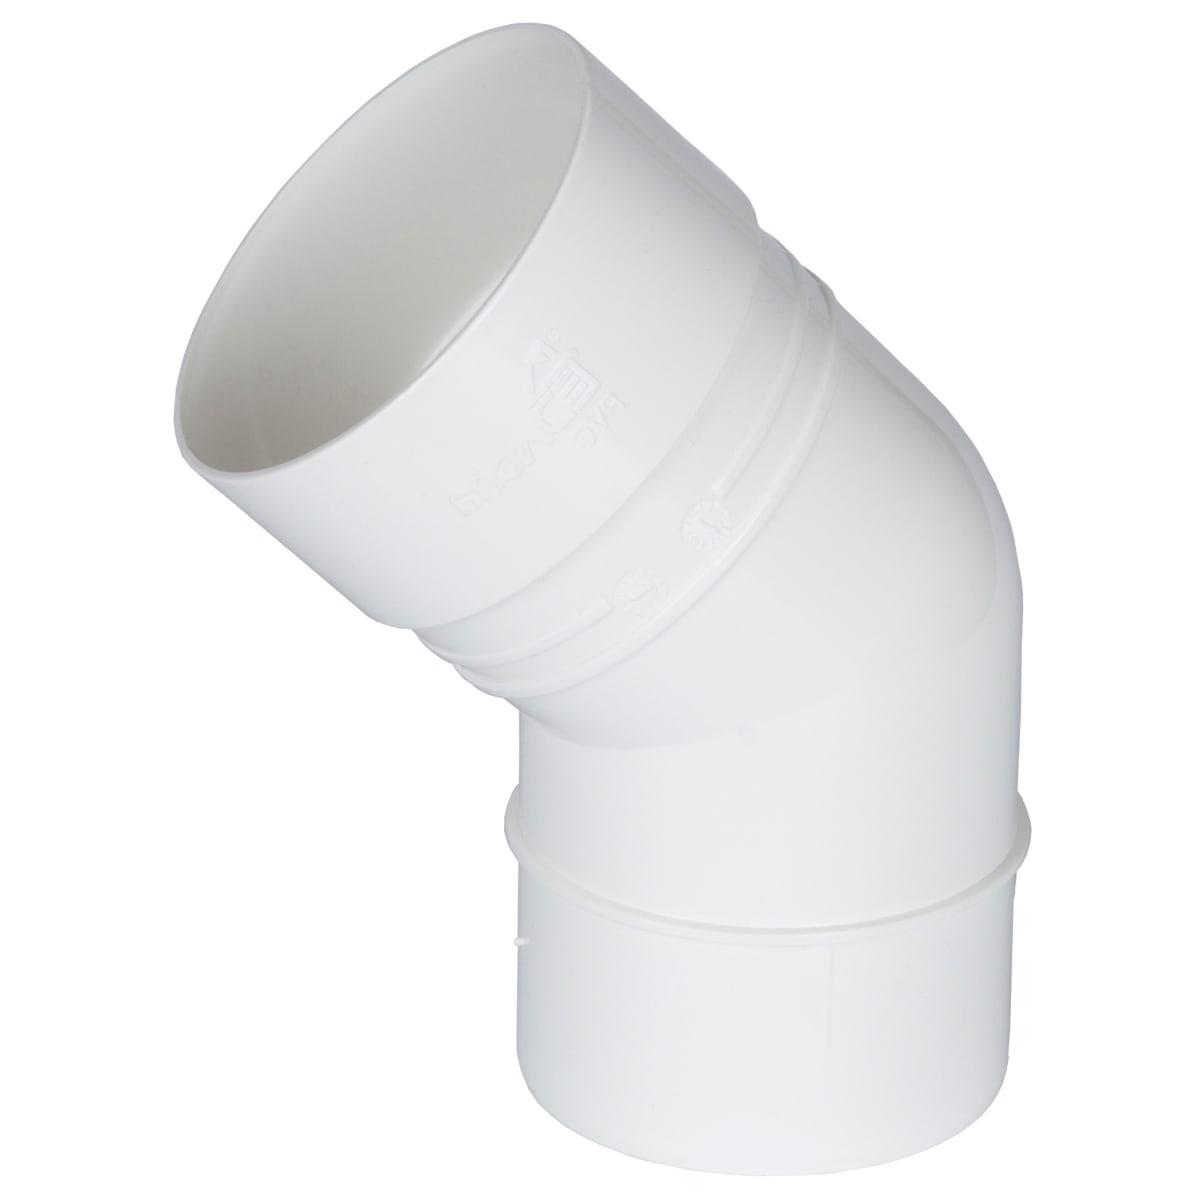 Колено Dacha 80 мм 45 градусов цвет белый